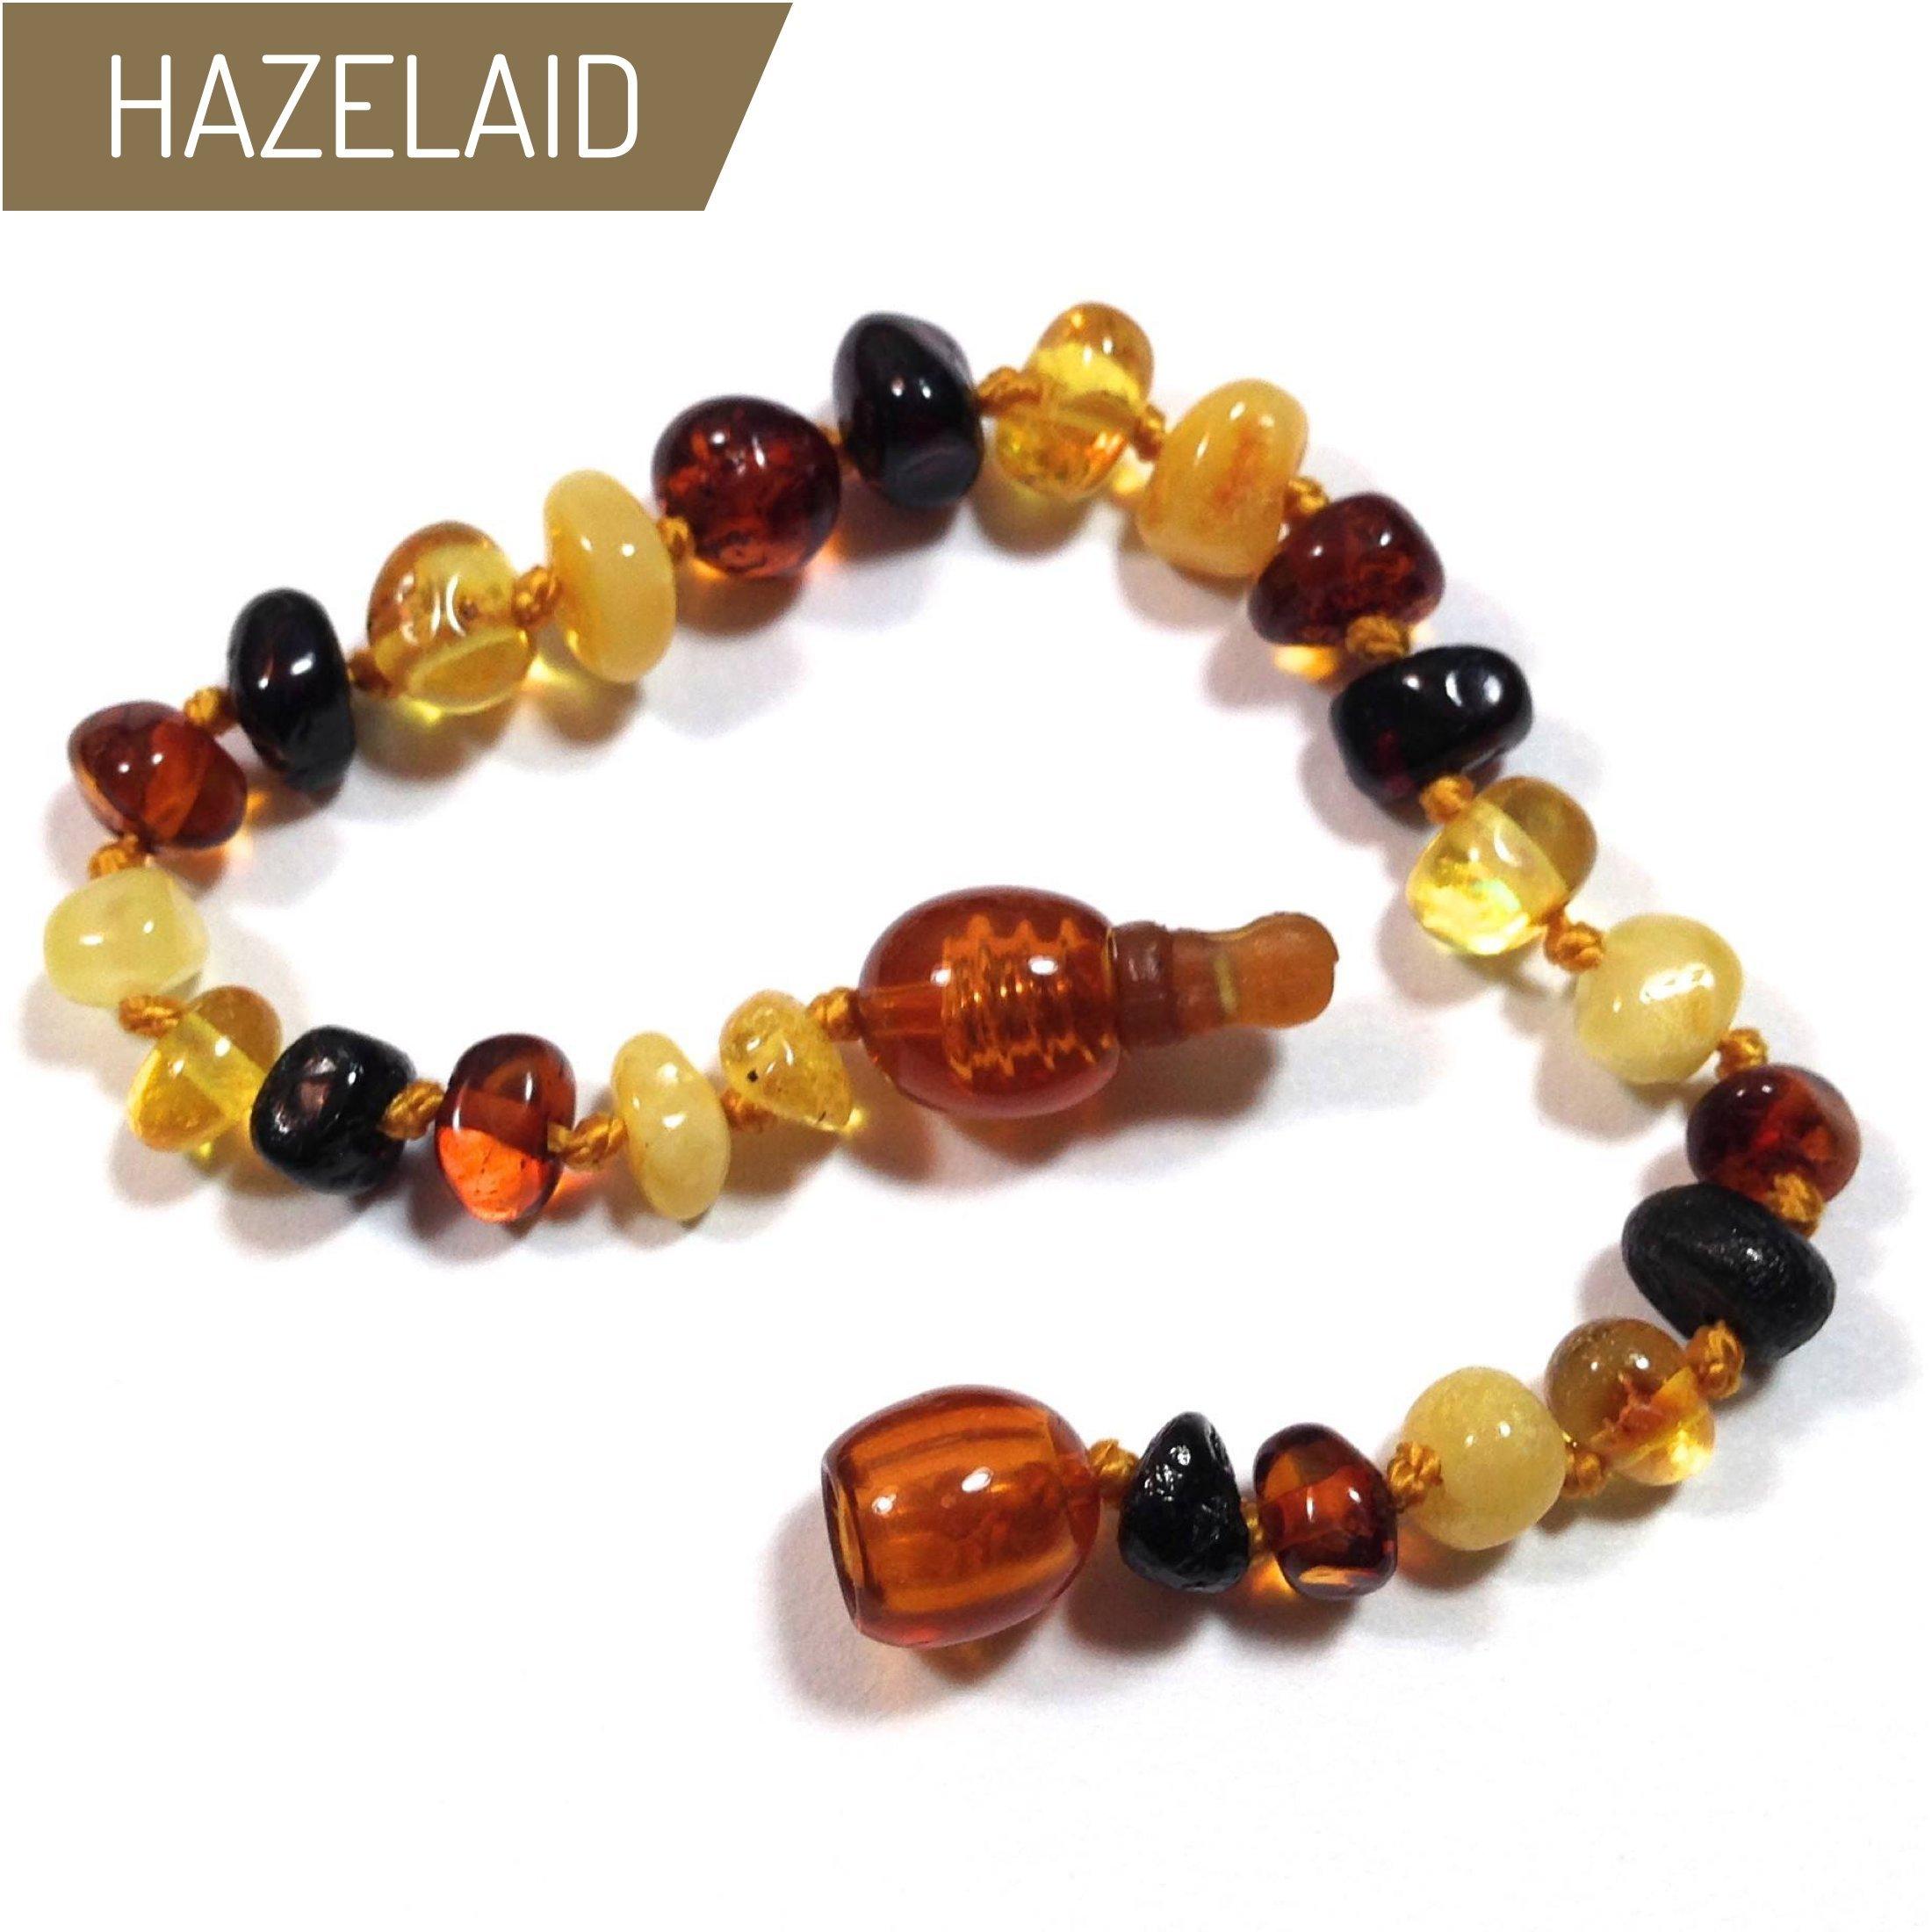 Hazelaid (TM) 5.5'' Pop-Clasp Baltic Amber Multicolored Round Bracelet